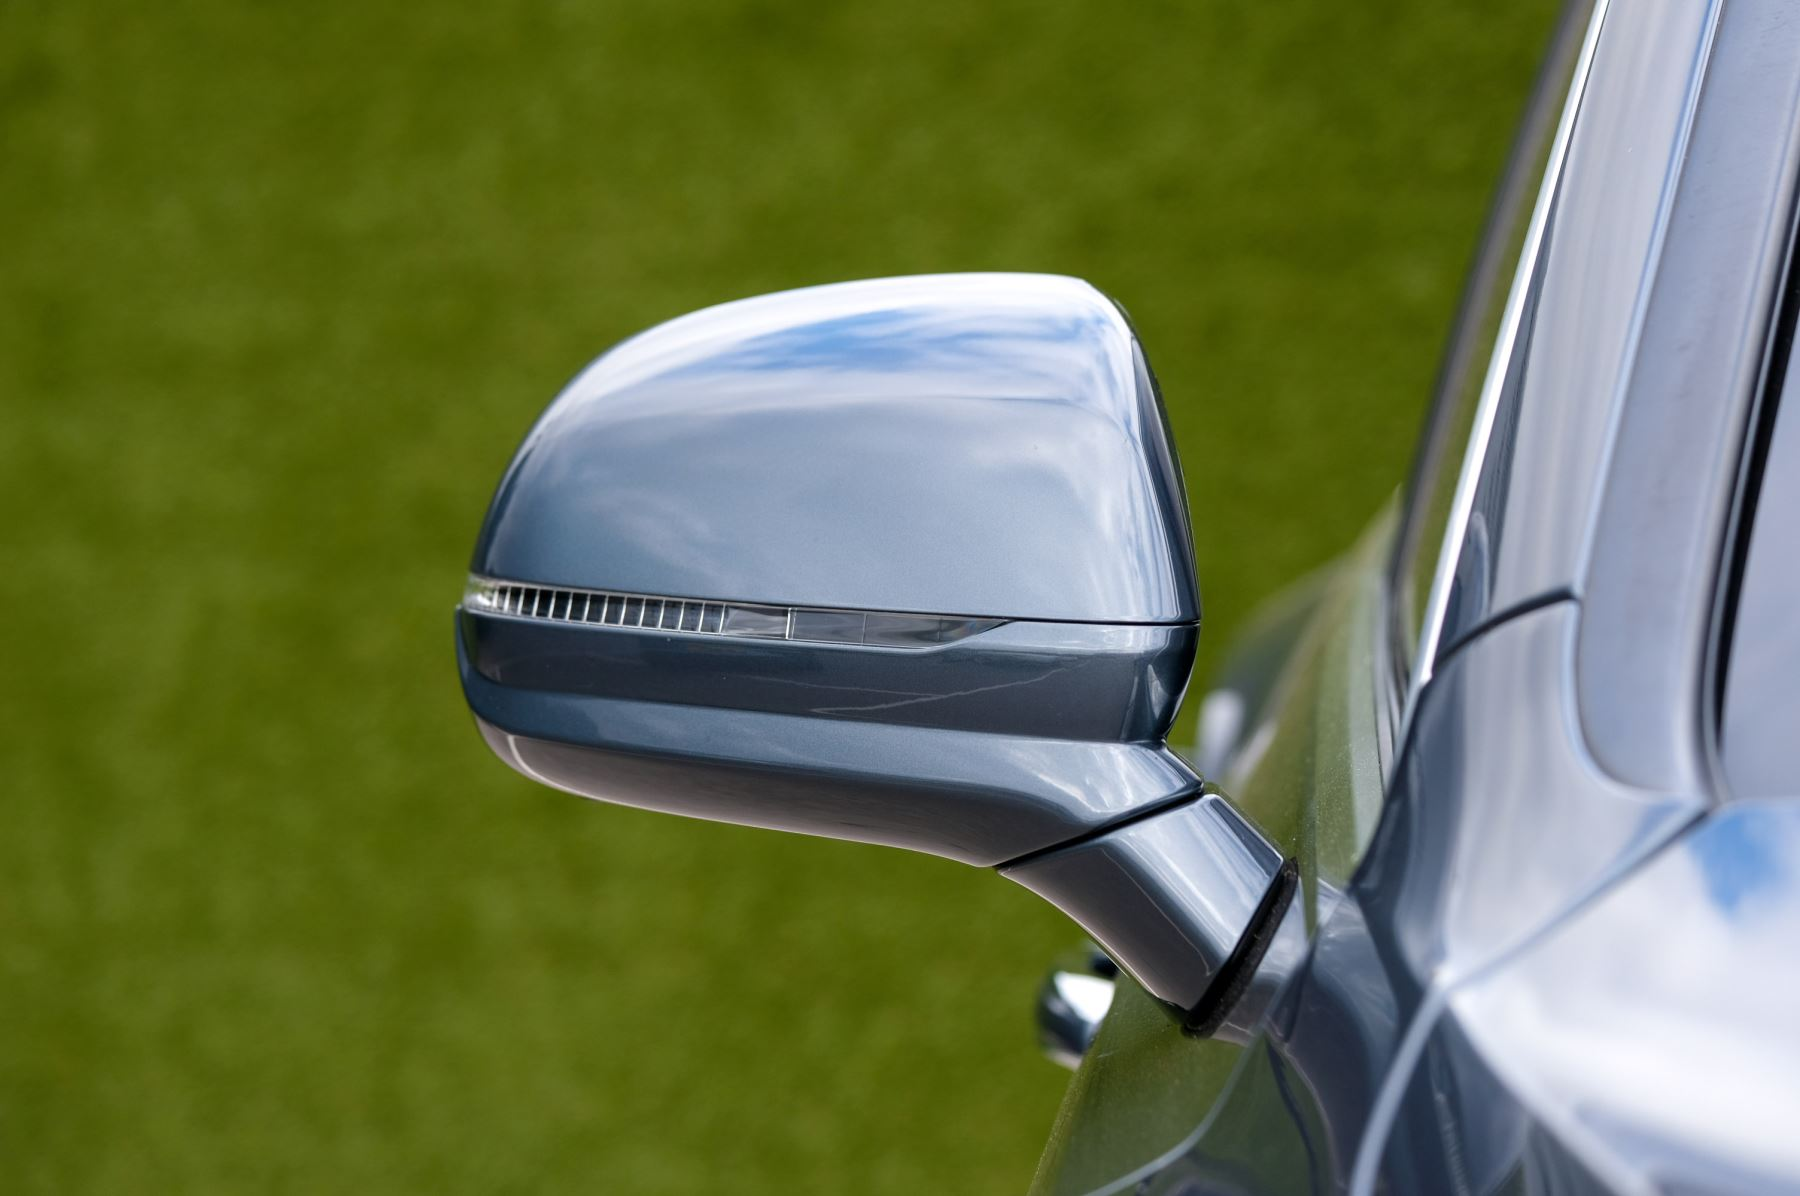 Bentley Bentayga 4.0 V8 5dr - Mulliner Driving Specification - City & Tour Specification image 10